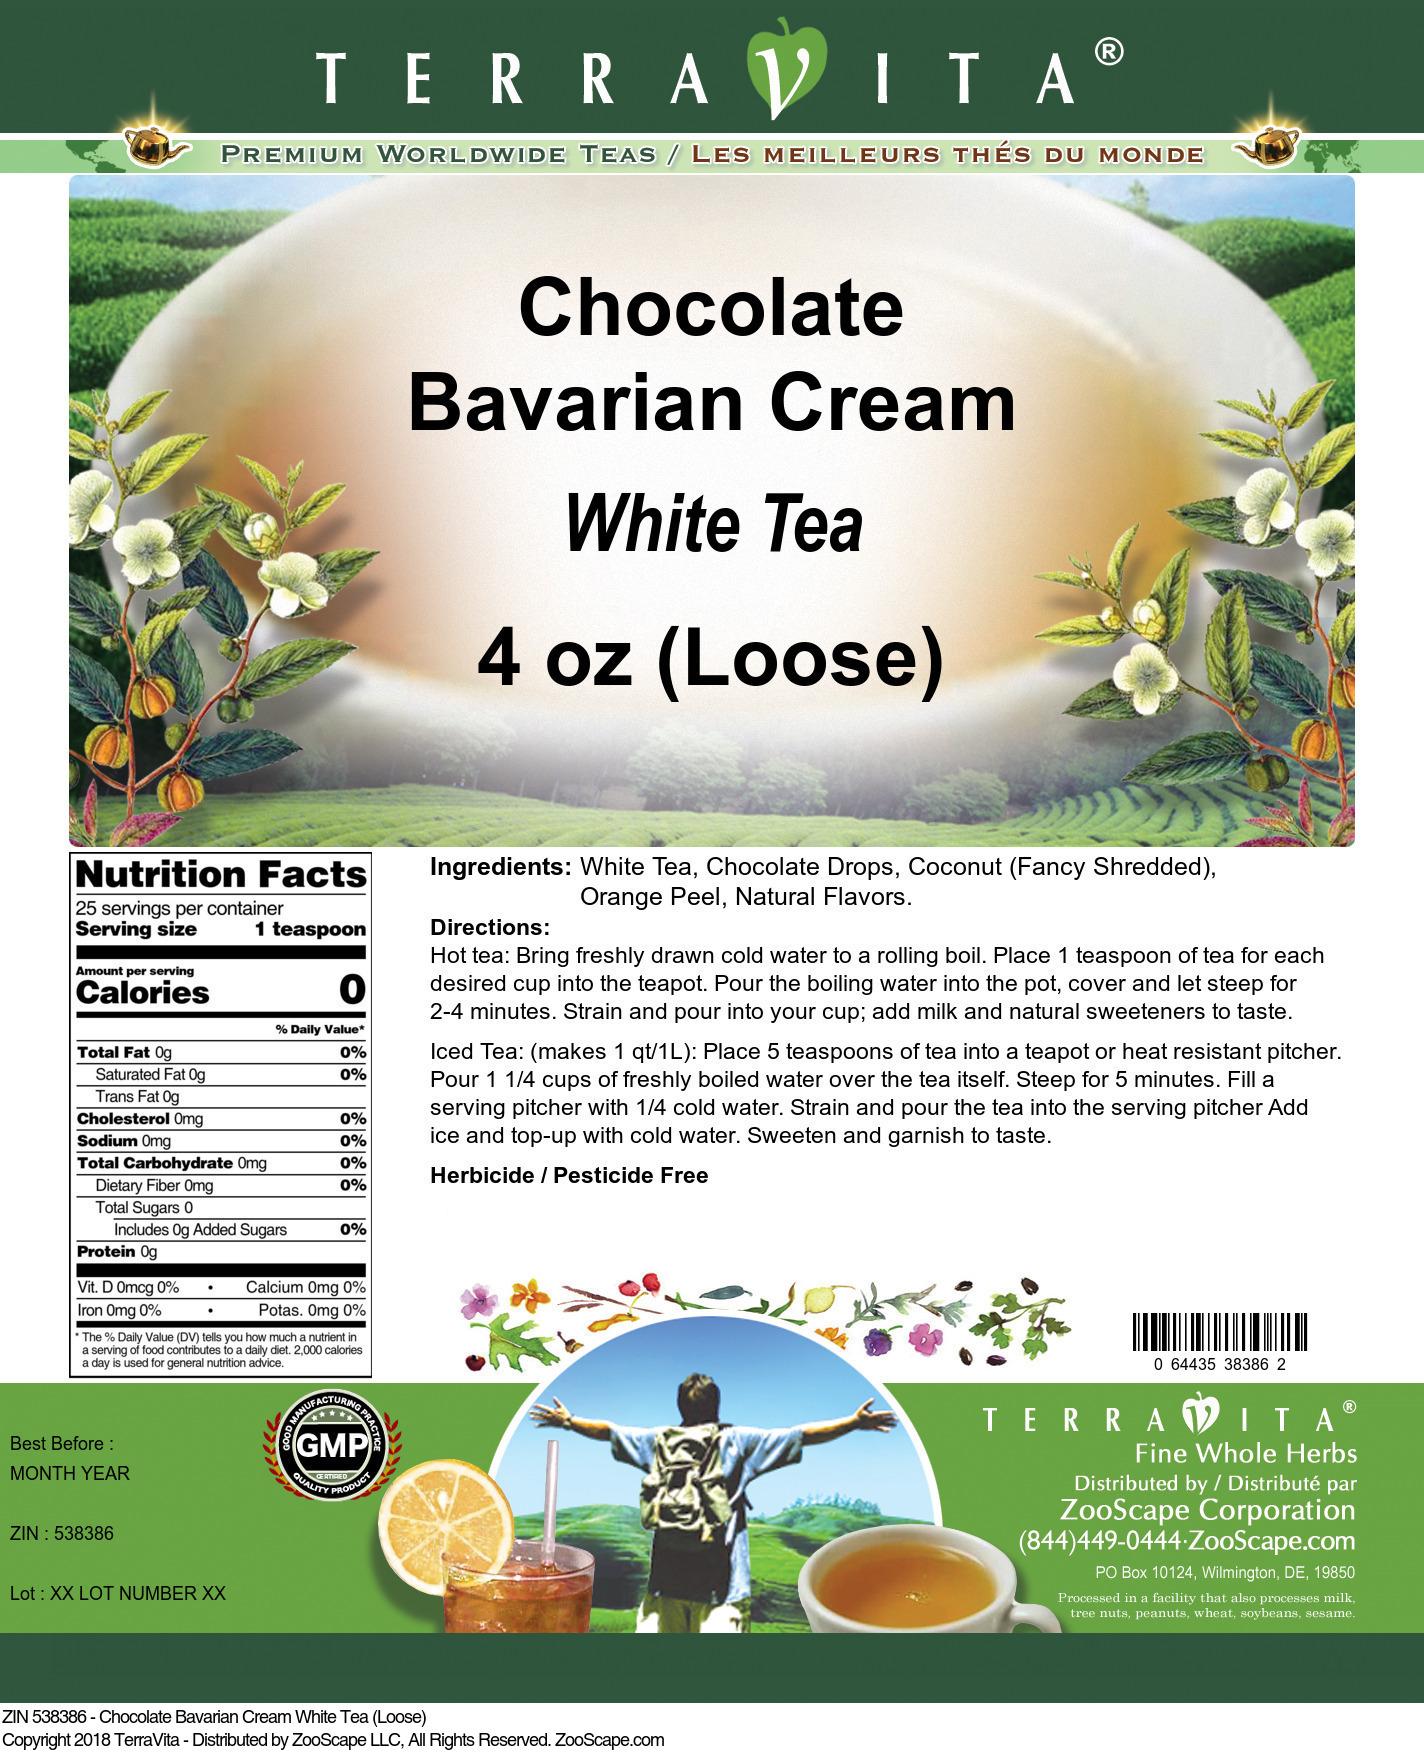 Chocolate Bavarian Cream White Tea